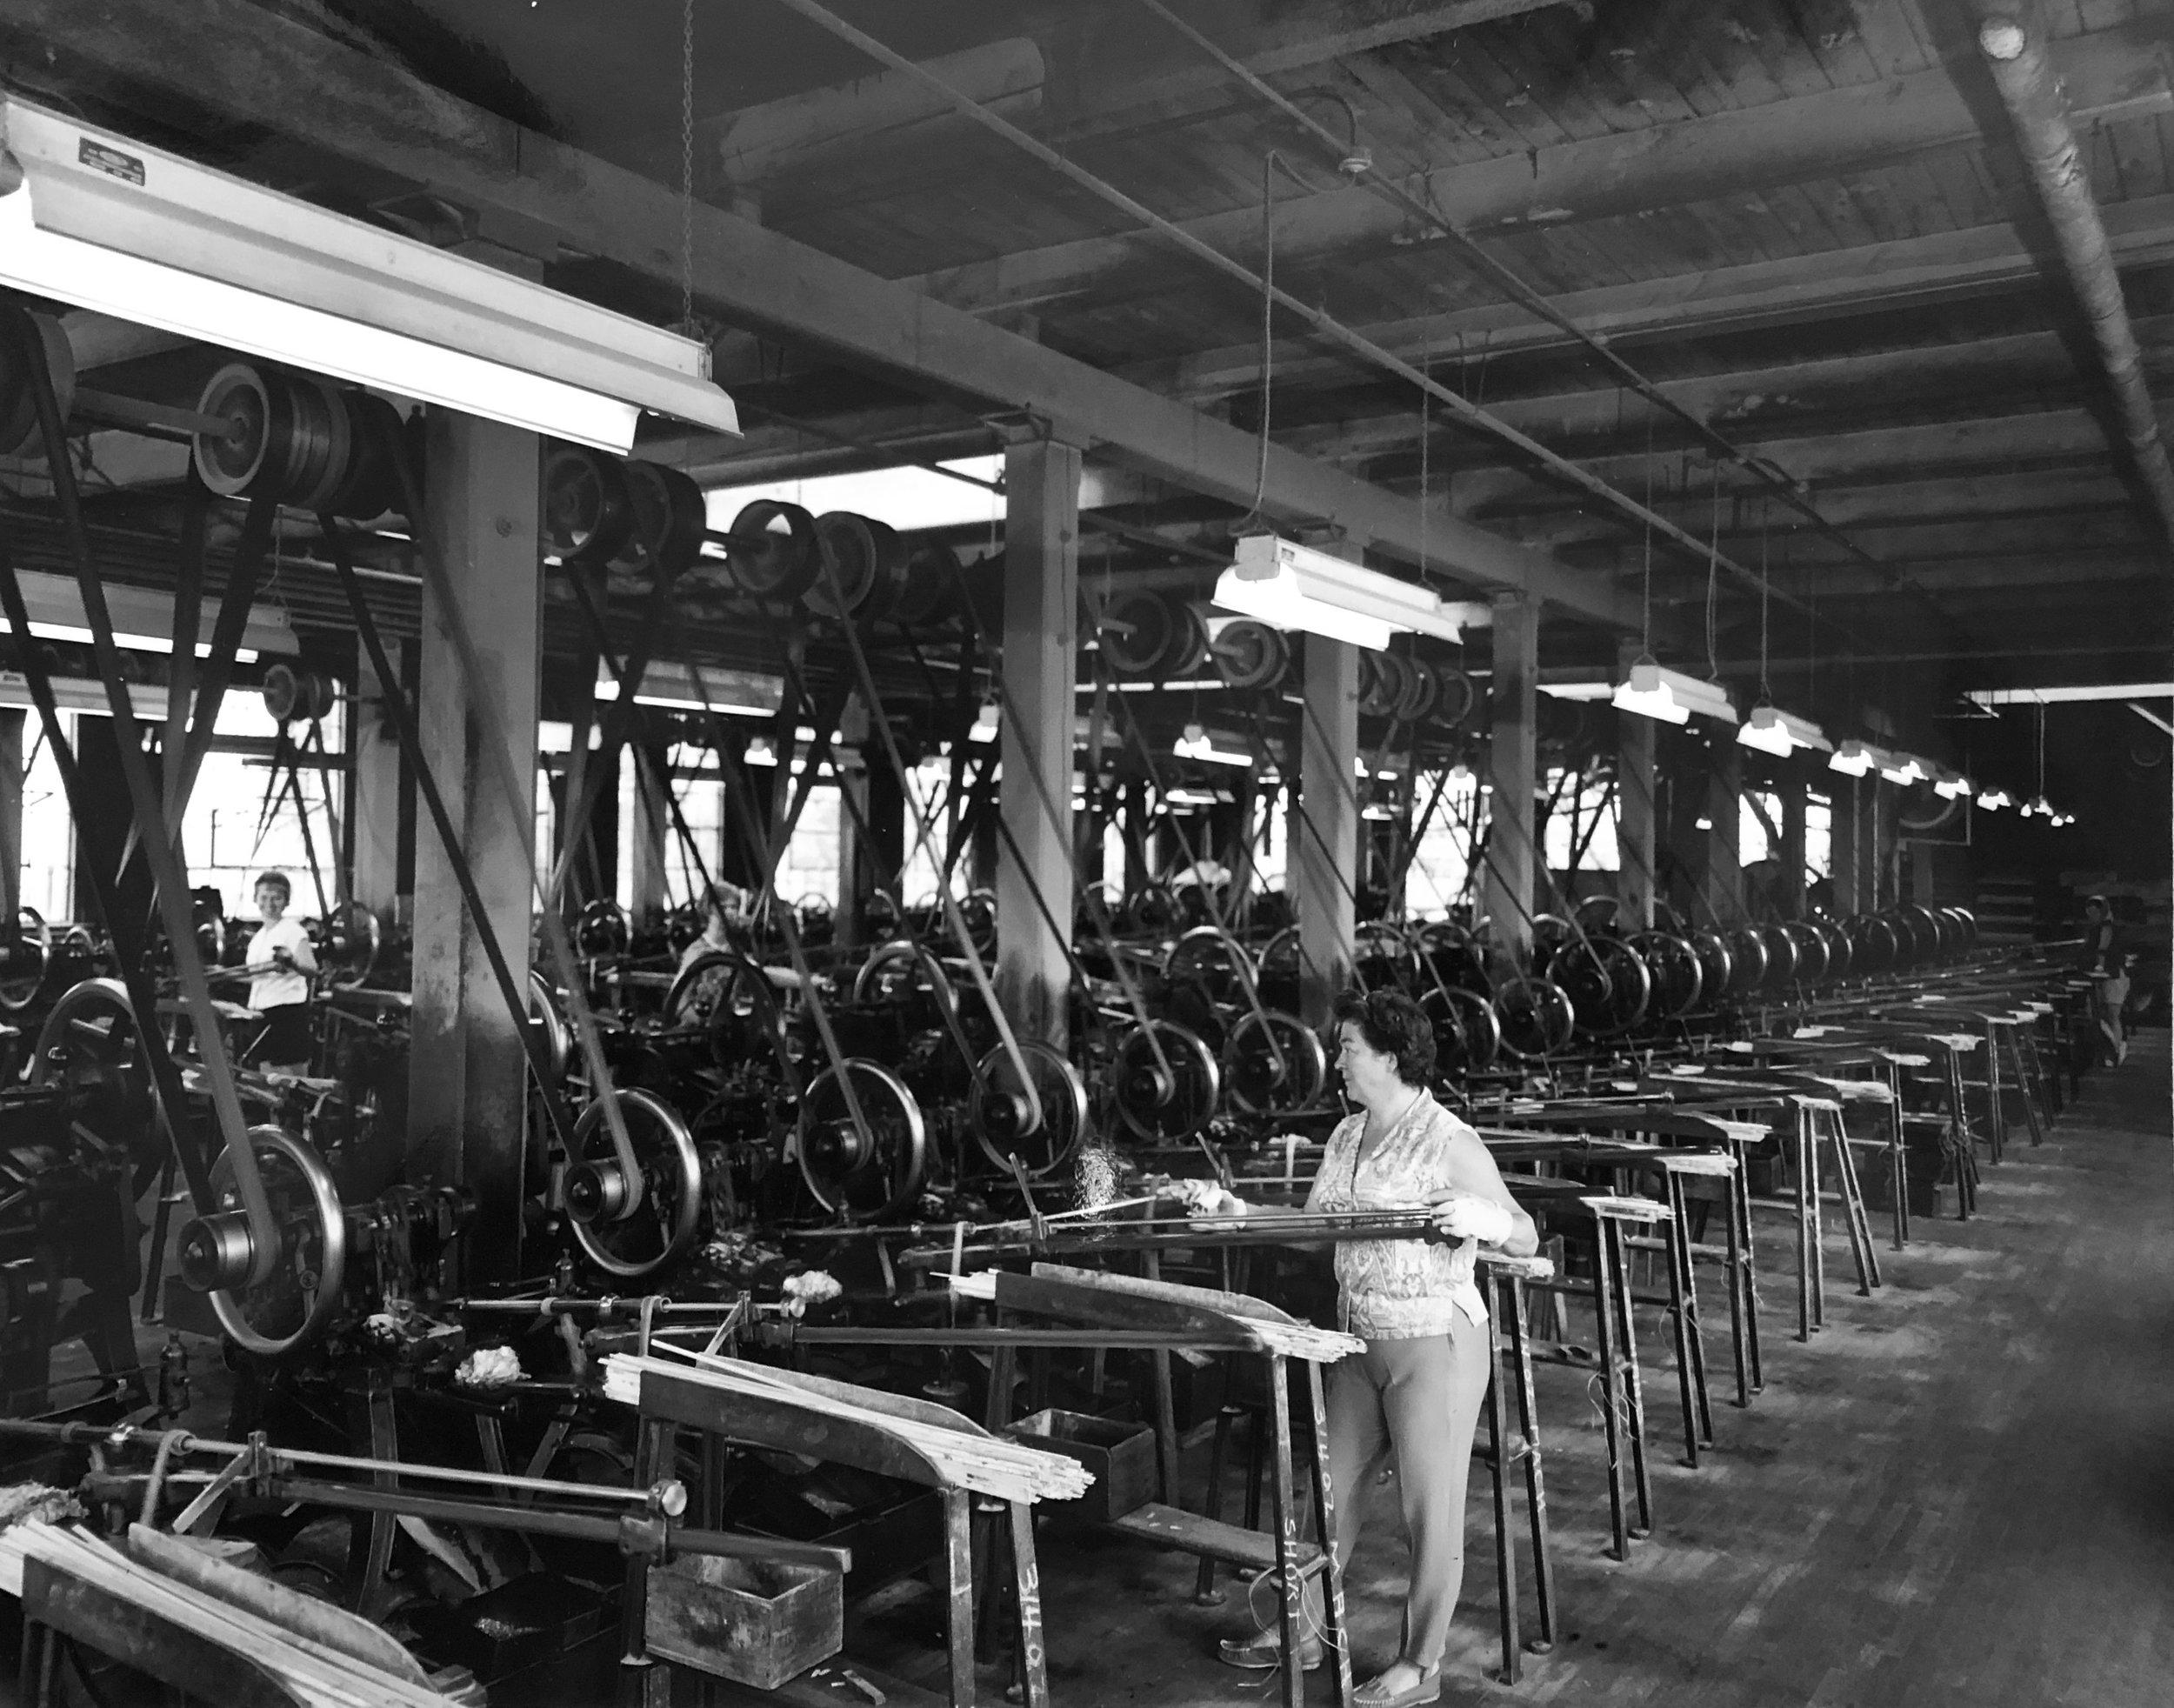 Bank of Cut Tack machines at United Shoe Canada